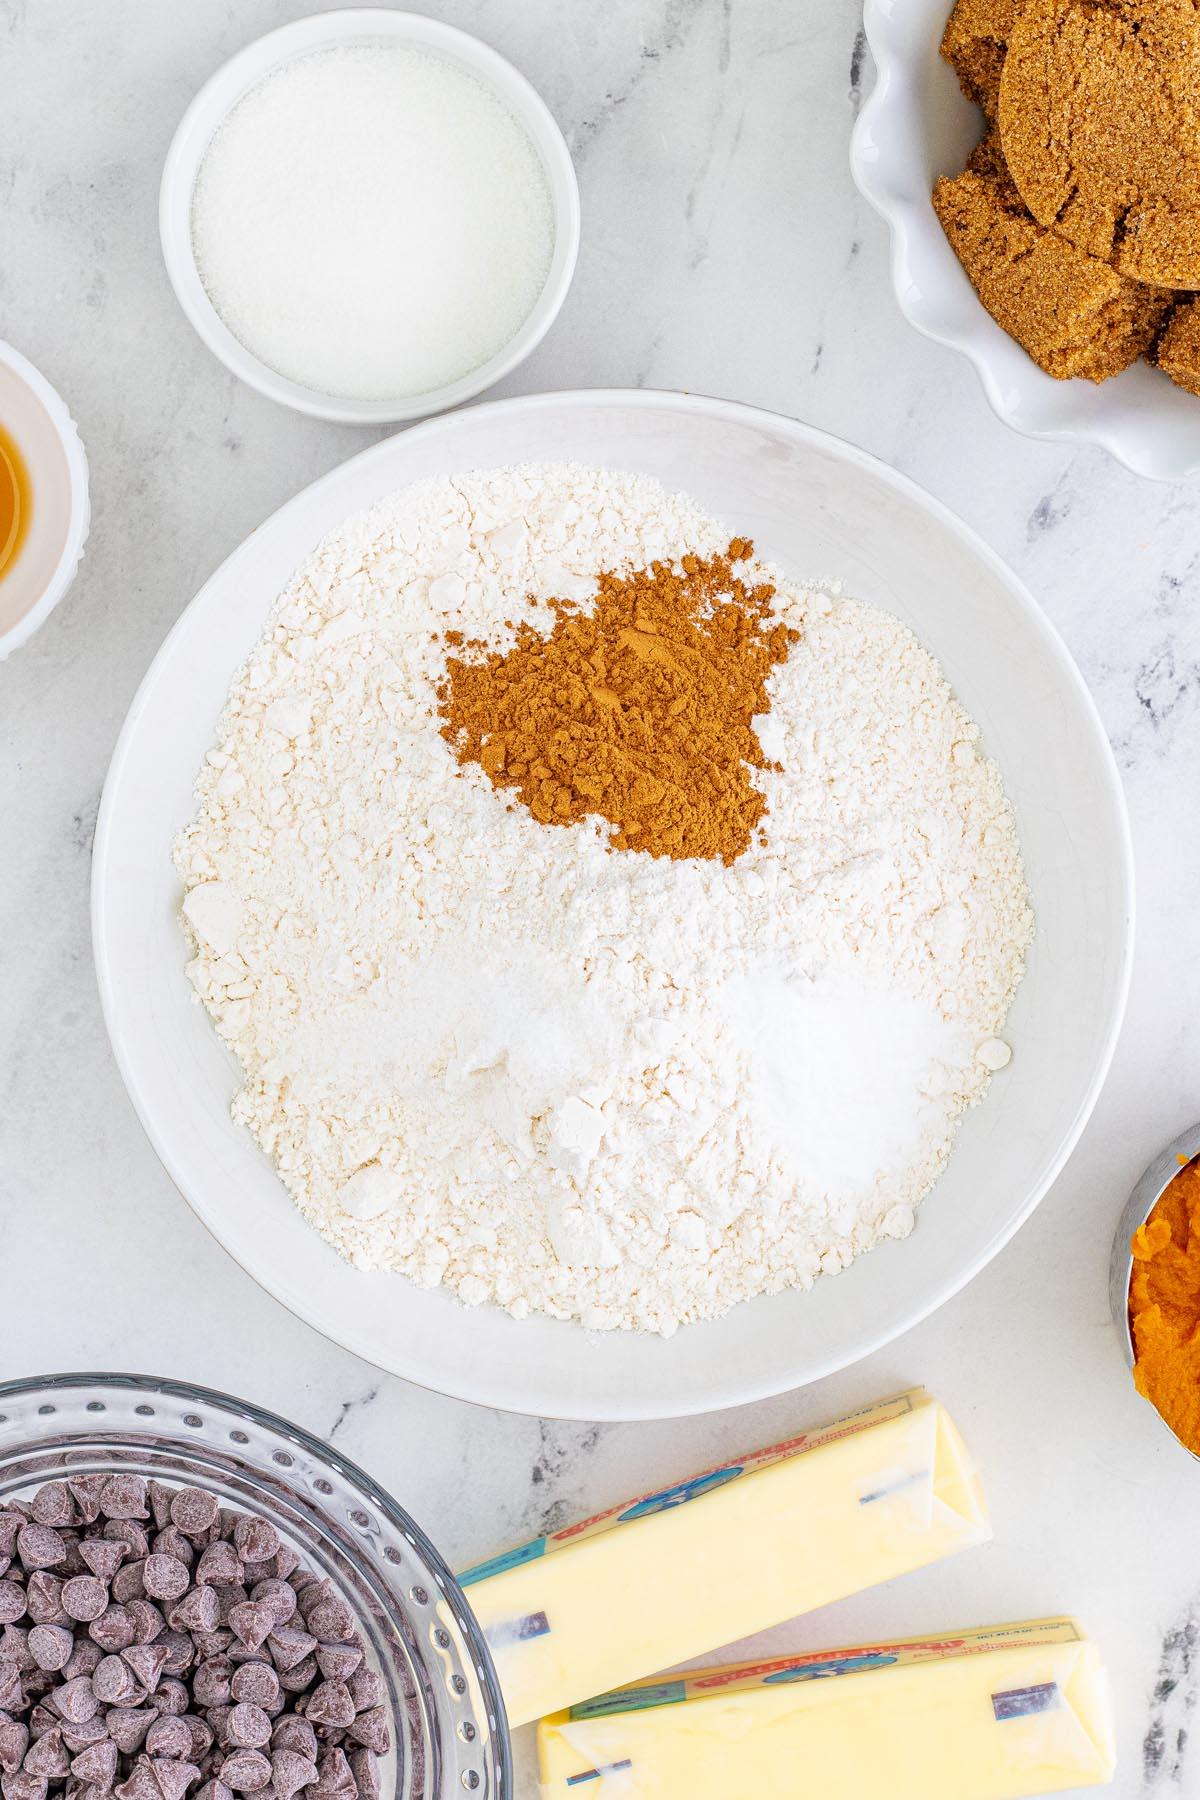 Mix the flour, pumpkin spice, baking soda, and salt together